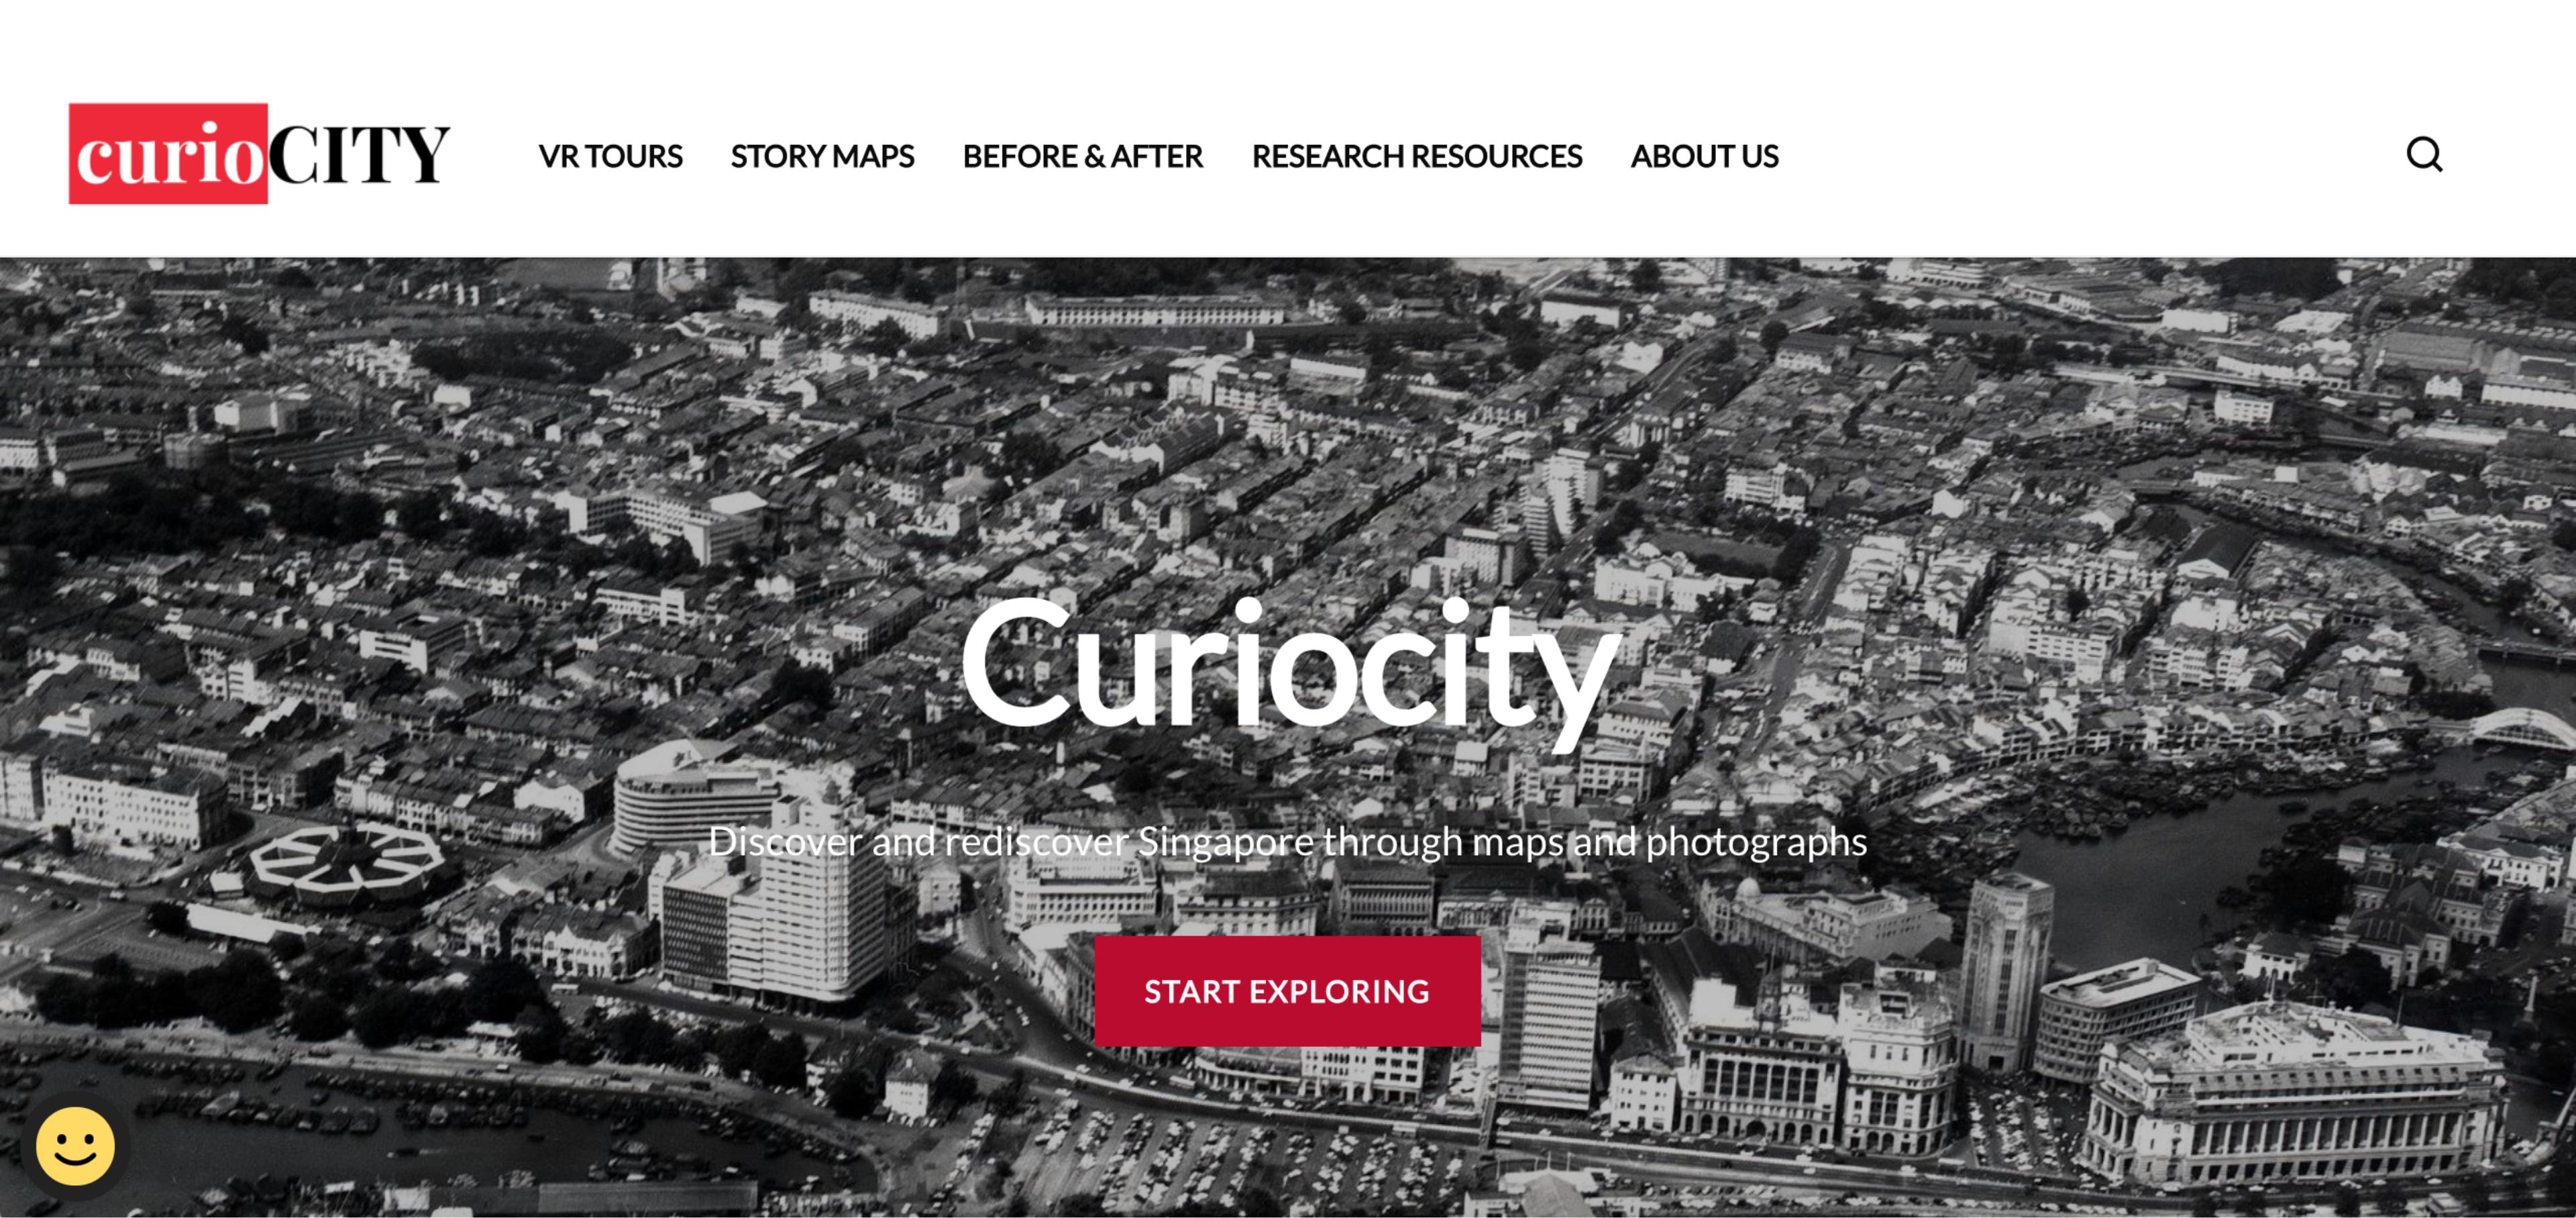 Curiocity screengrab